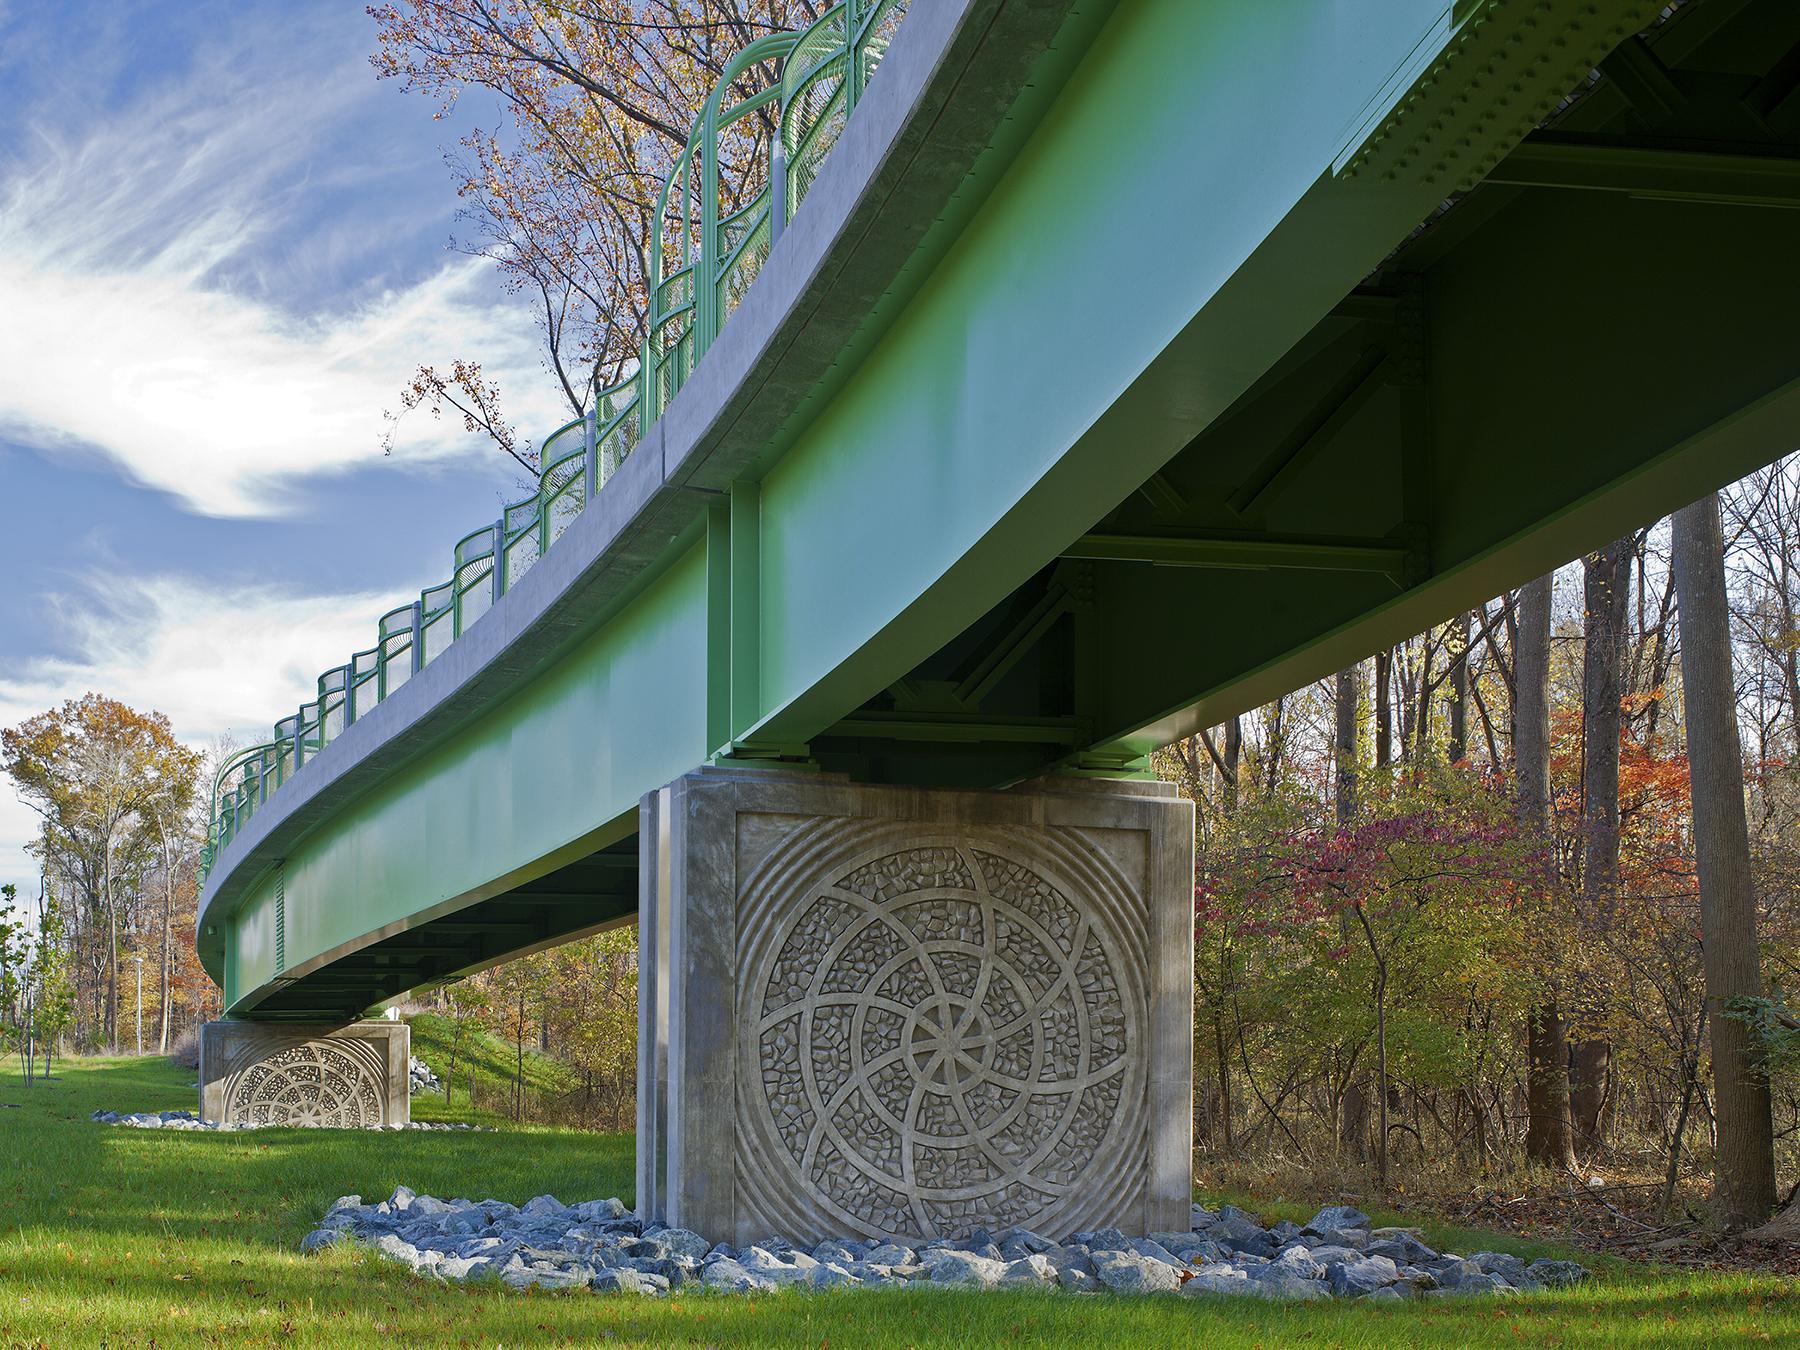 Rock Creek Pedestrian Bridge